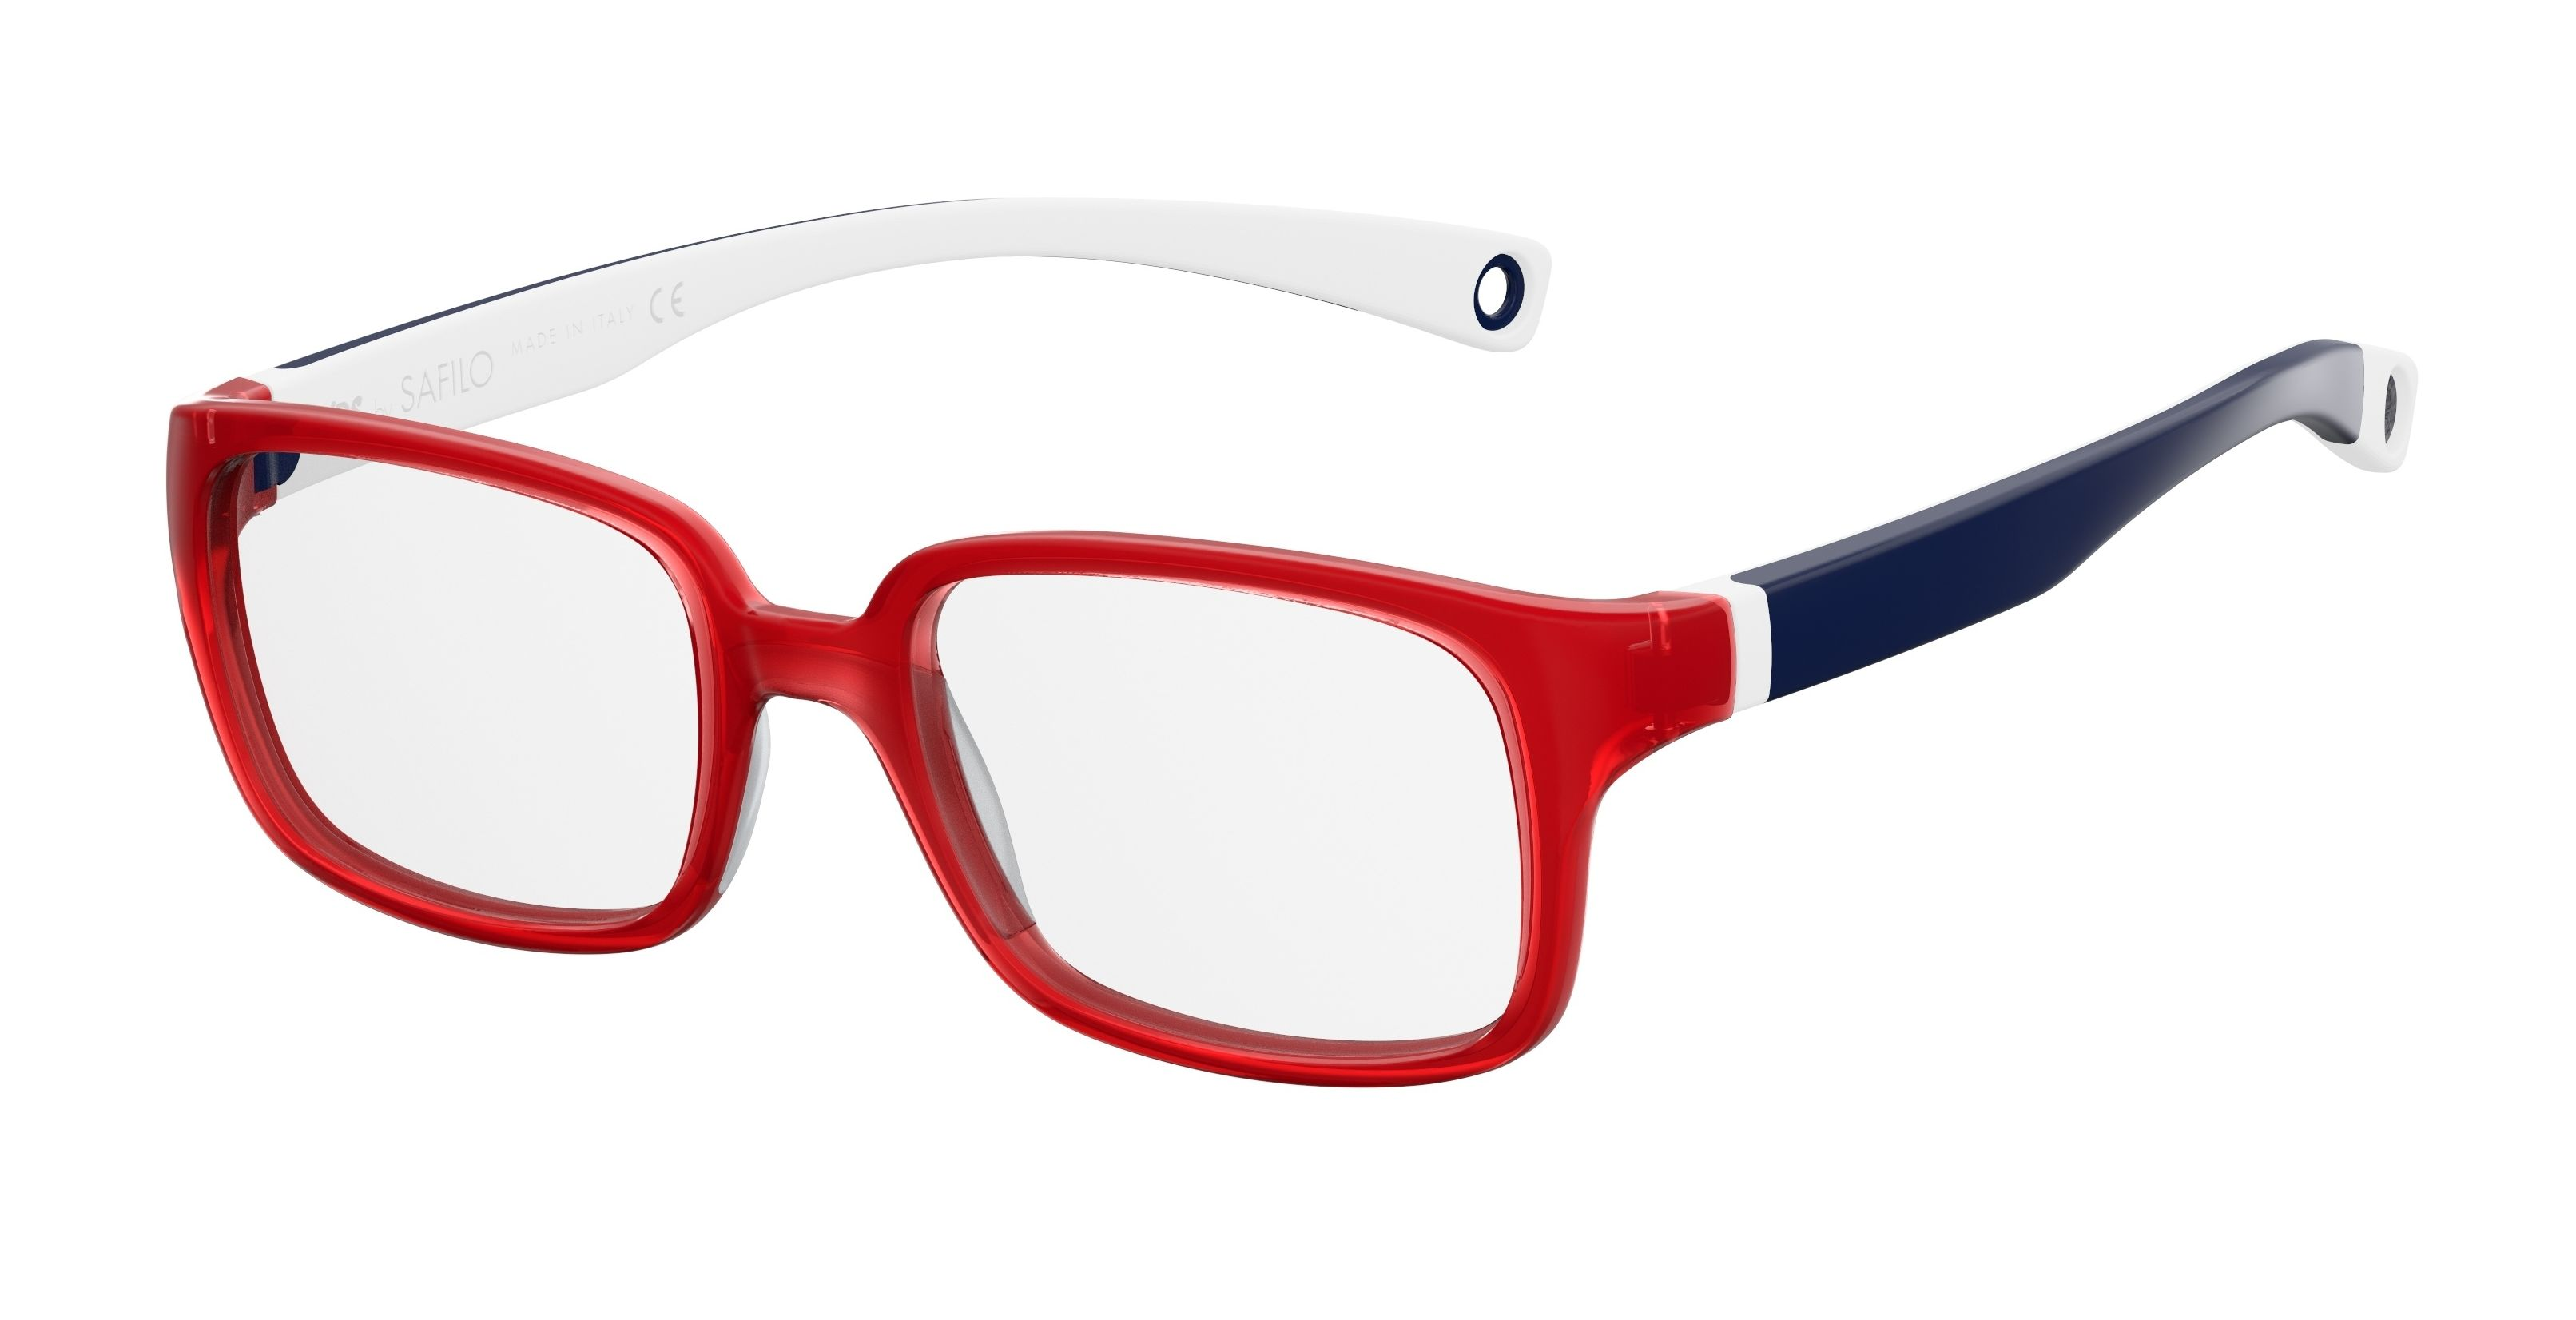 ee0acaee786 Eyewear for Kids - Kids By Safilo - Optiwow